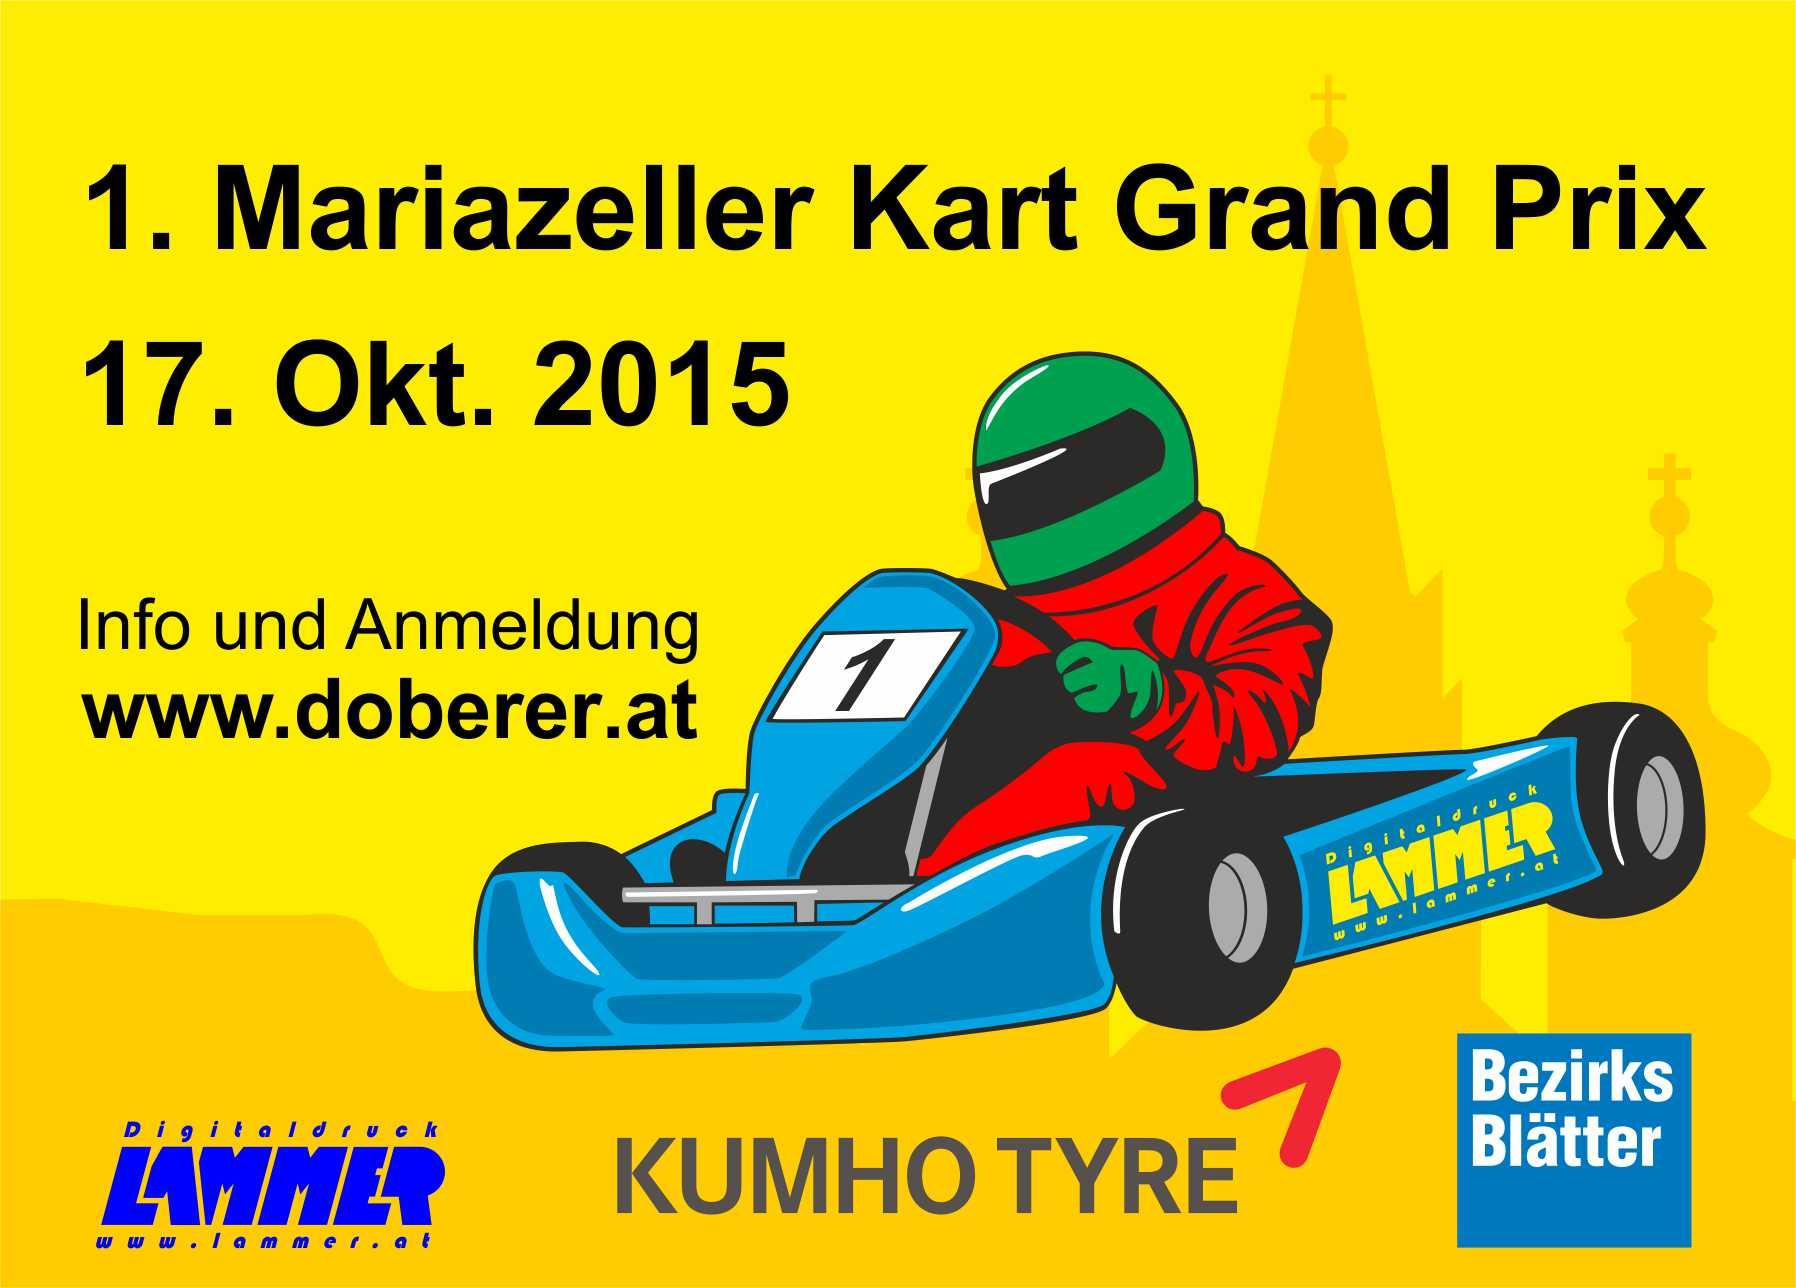 Mariazeller Kart Grand Prix